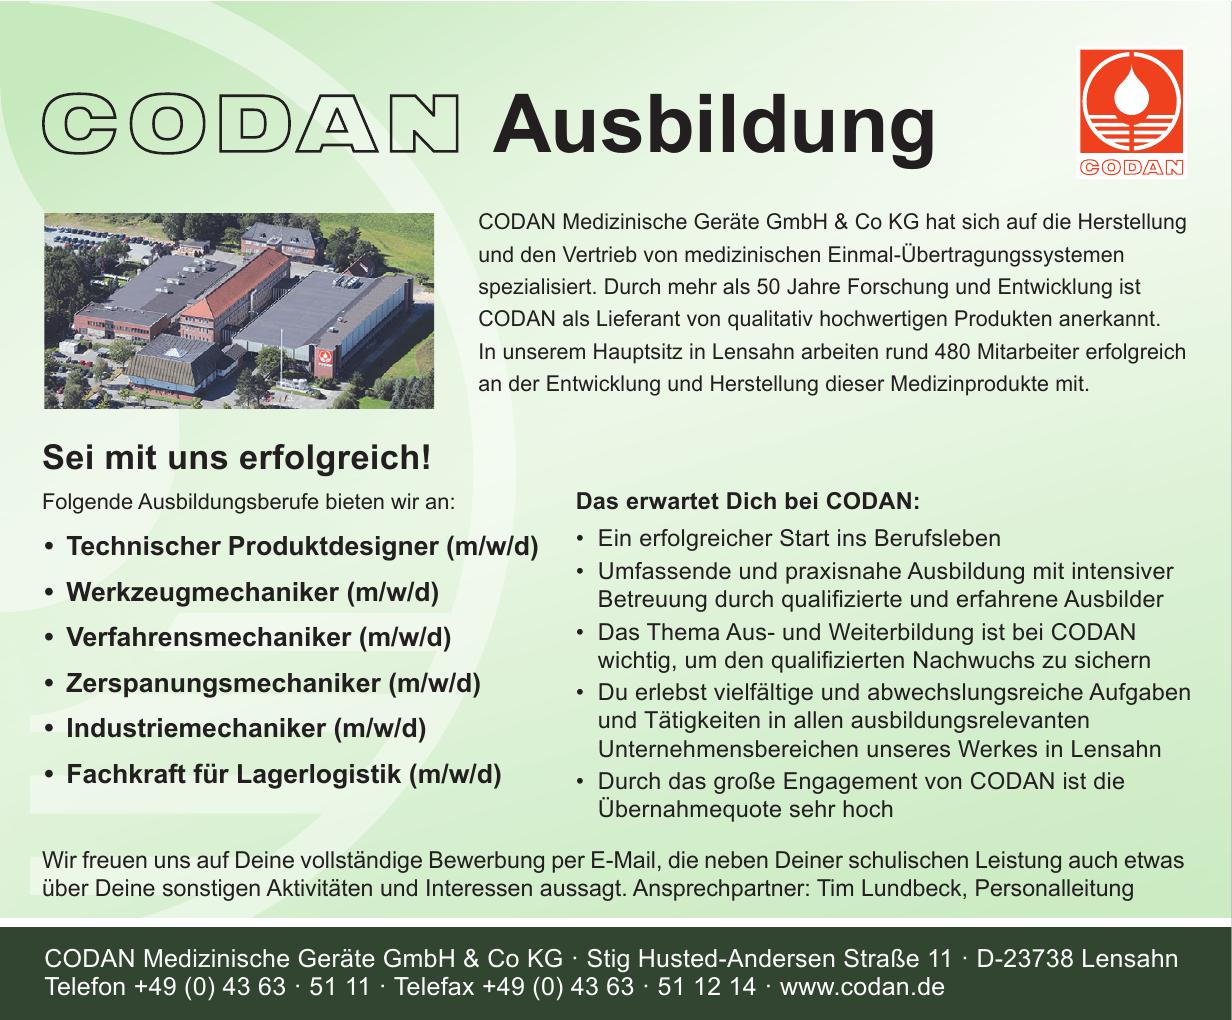 CODAN Medizinische Geräte GmbH & Co KG